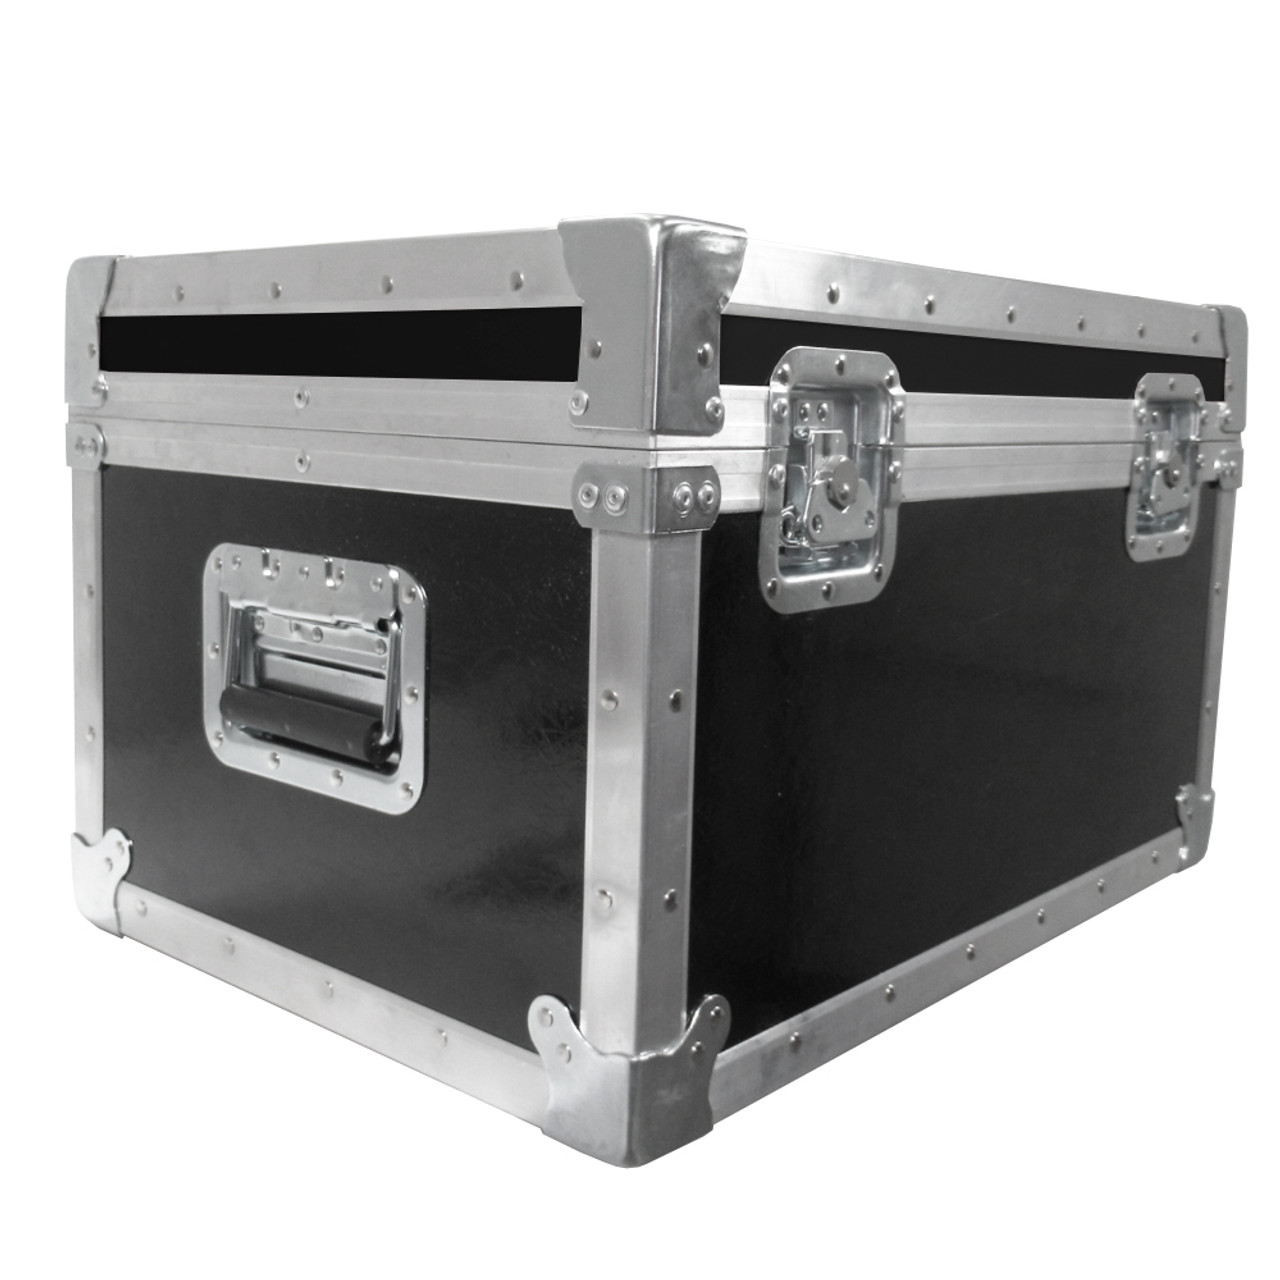 RED Komodo Dragon Camera (Fully Built ) Shipping Case